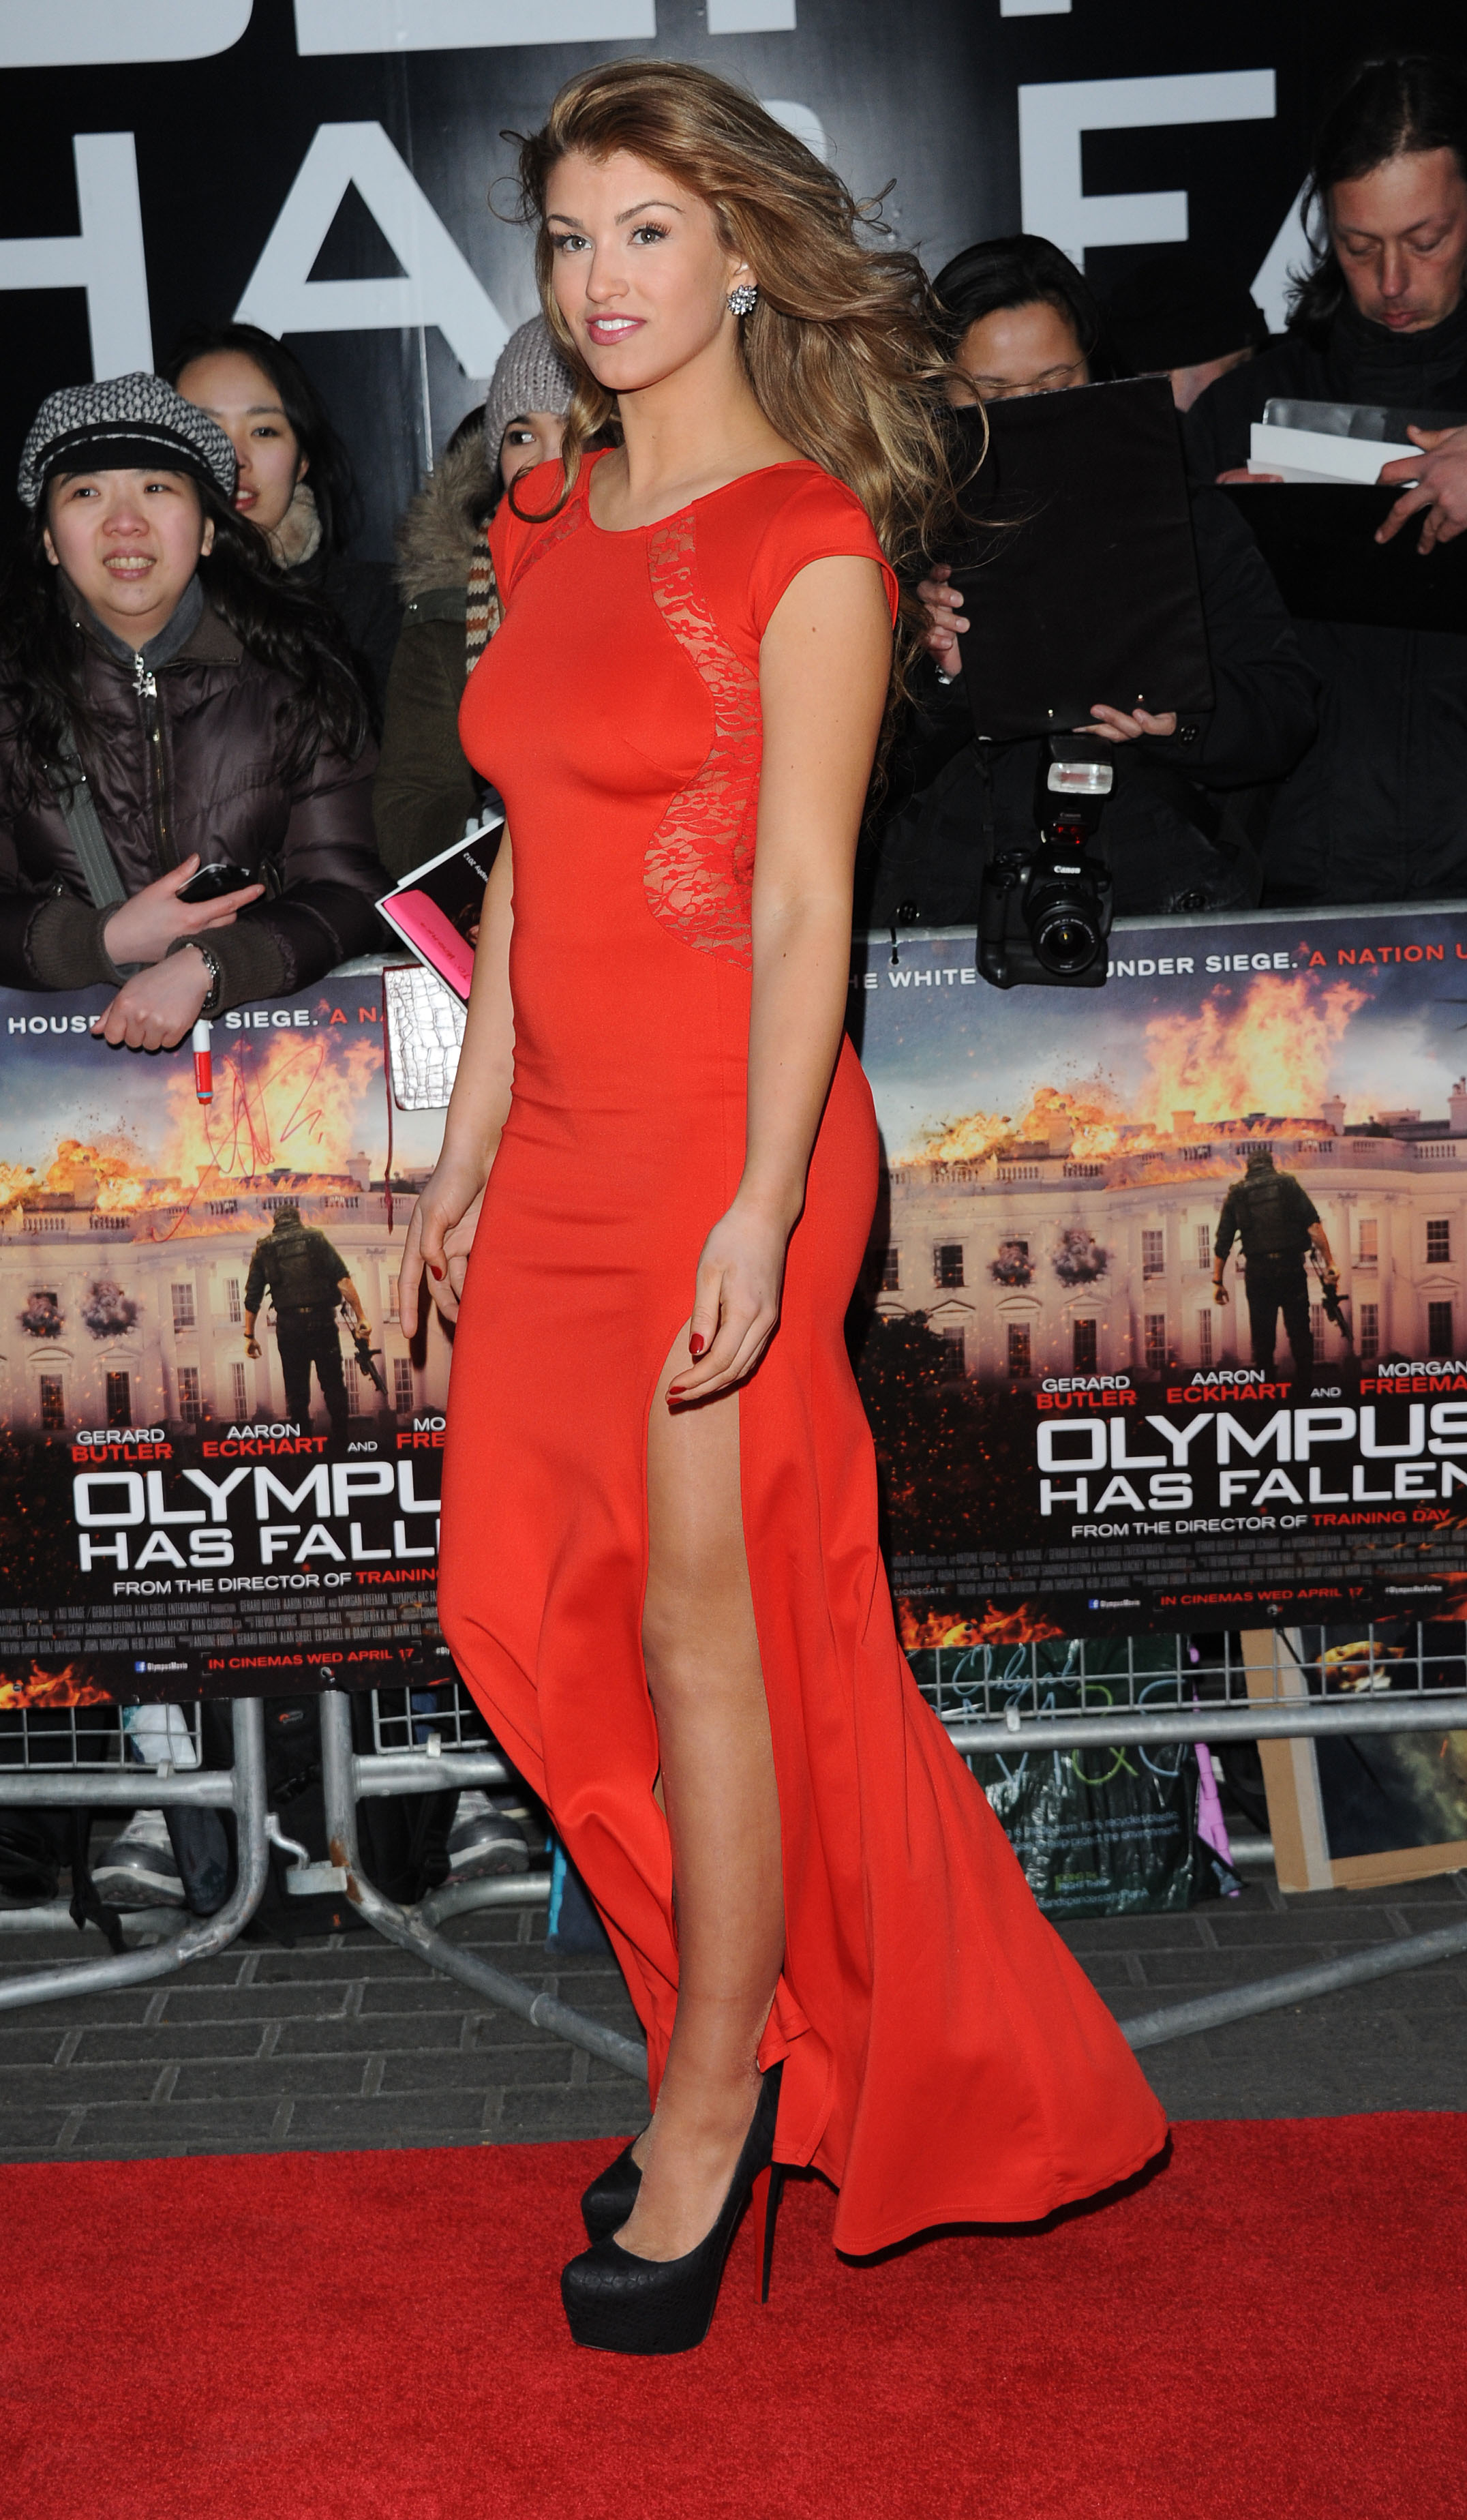 376408631_AmyWillerton_olympus_has_fallen_uk_prem_022_122_64lo.jpg